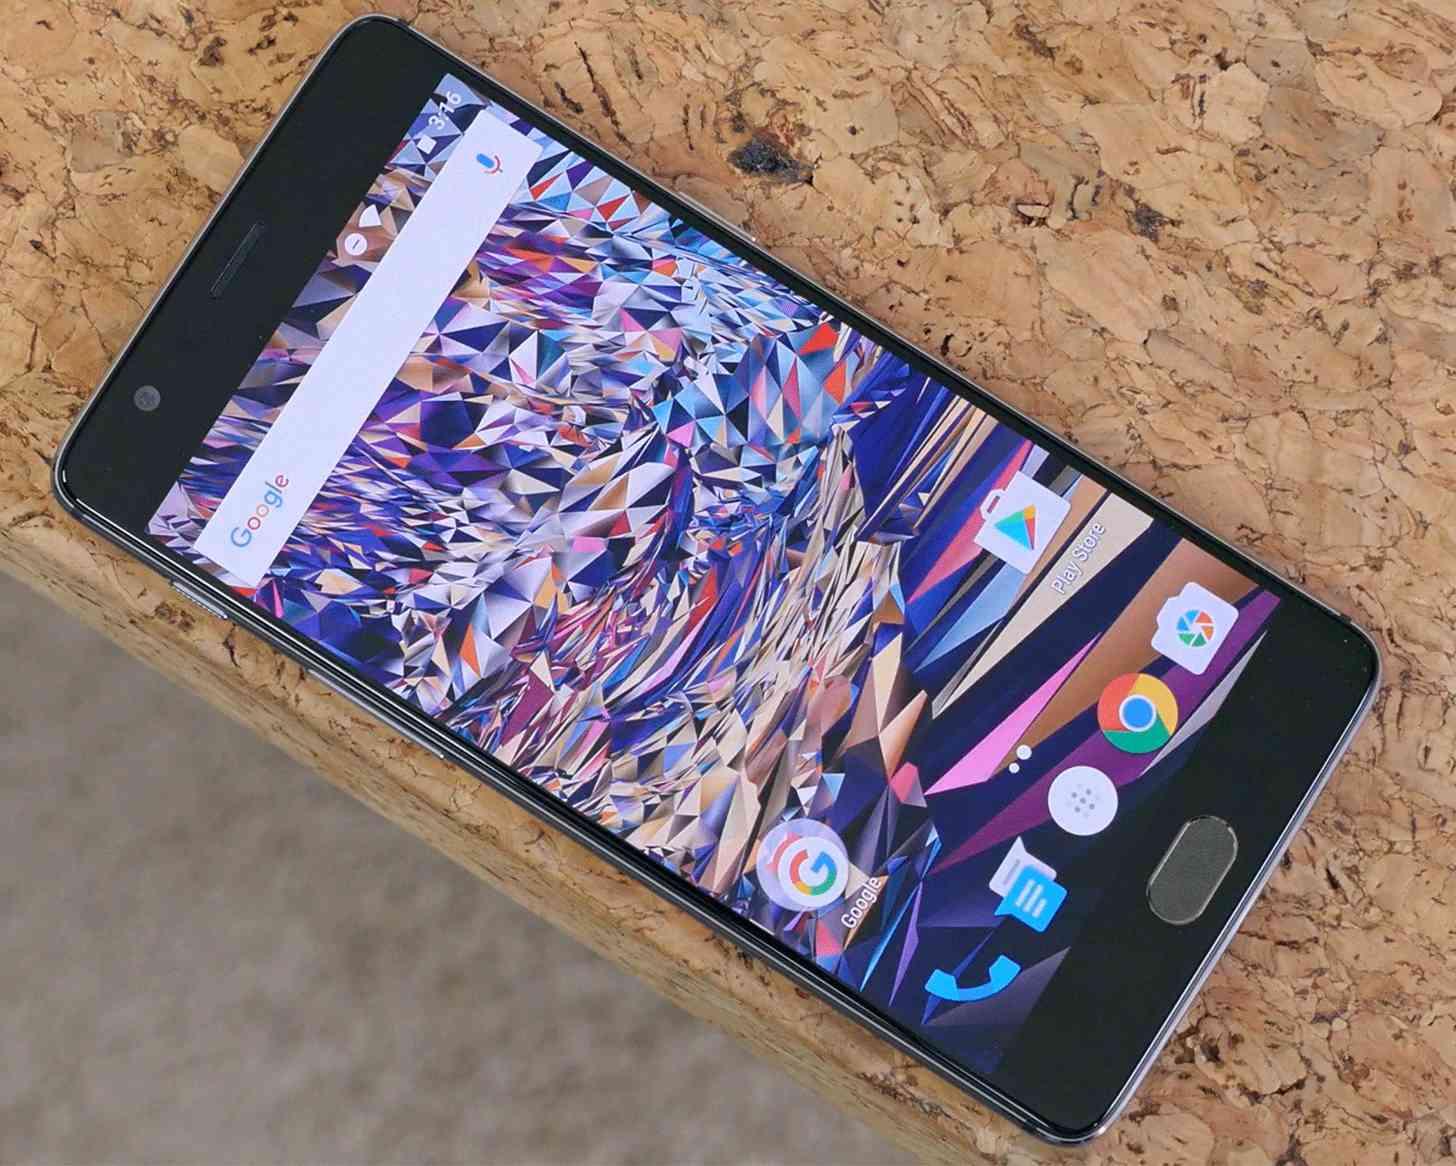 OnePlus 3 hands-on